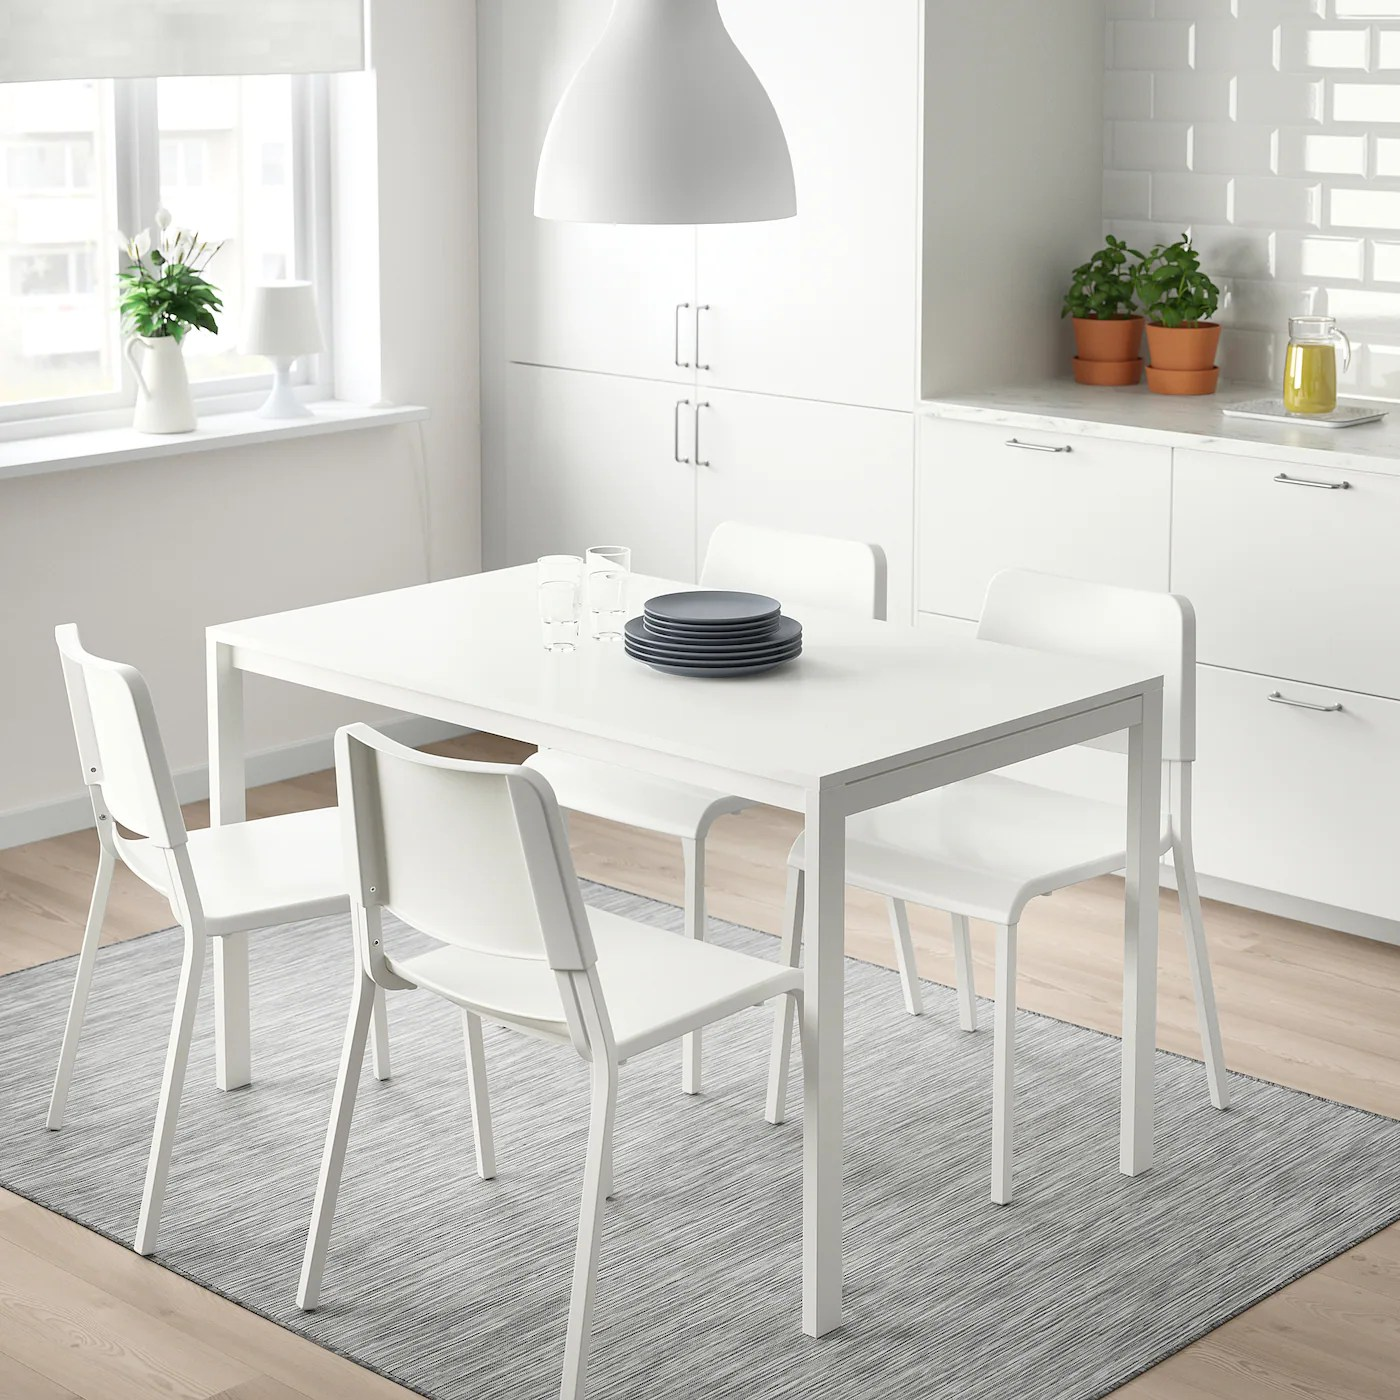 Melltorp Table Blanc 125x75 Cm Ikea